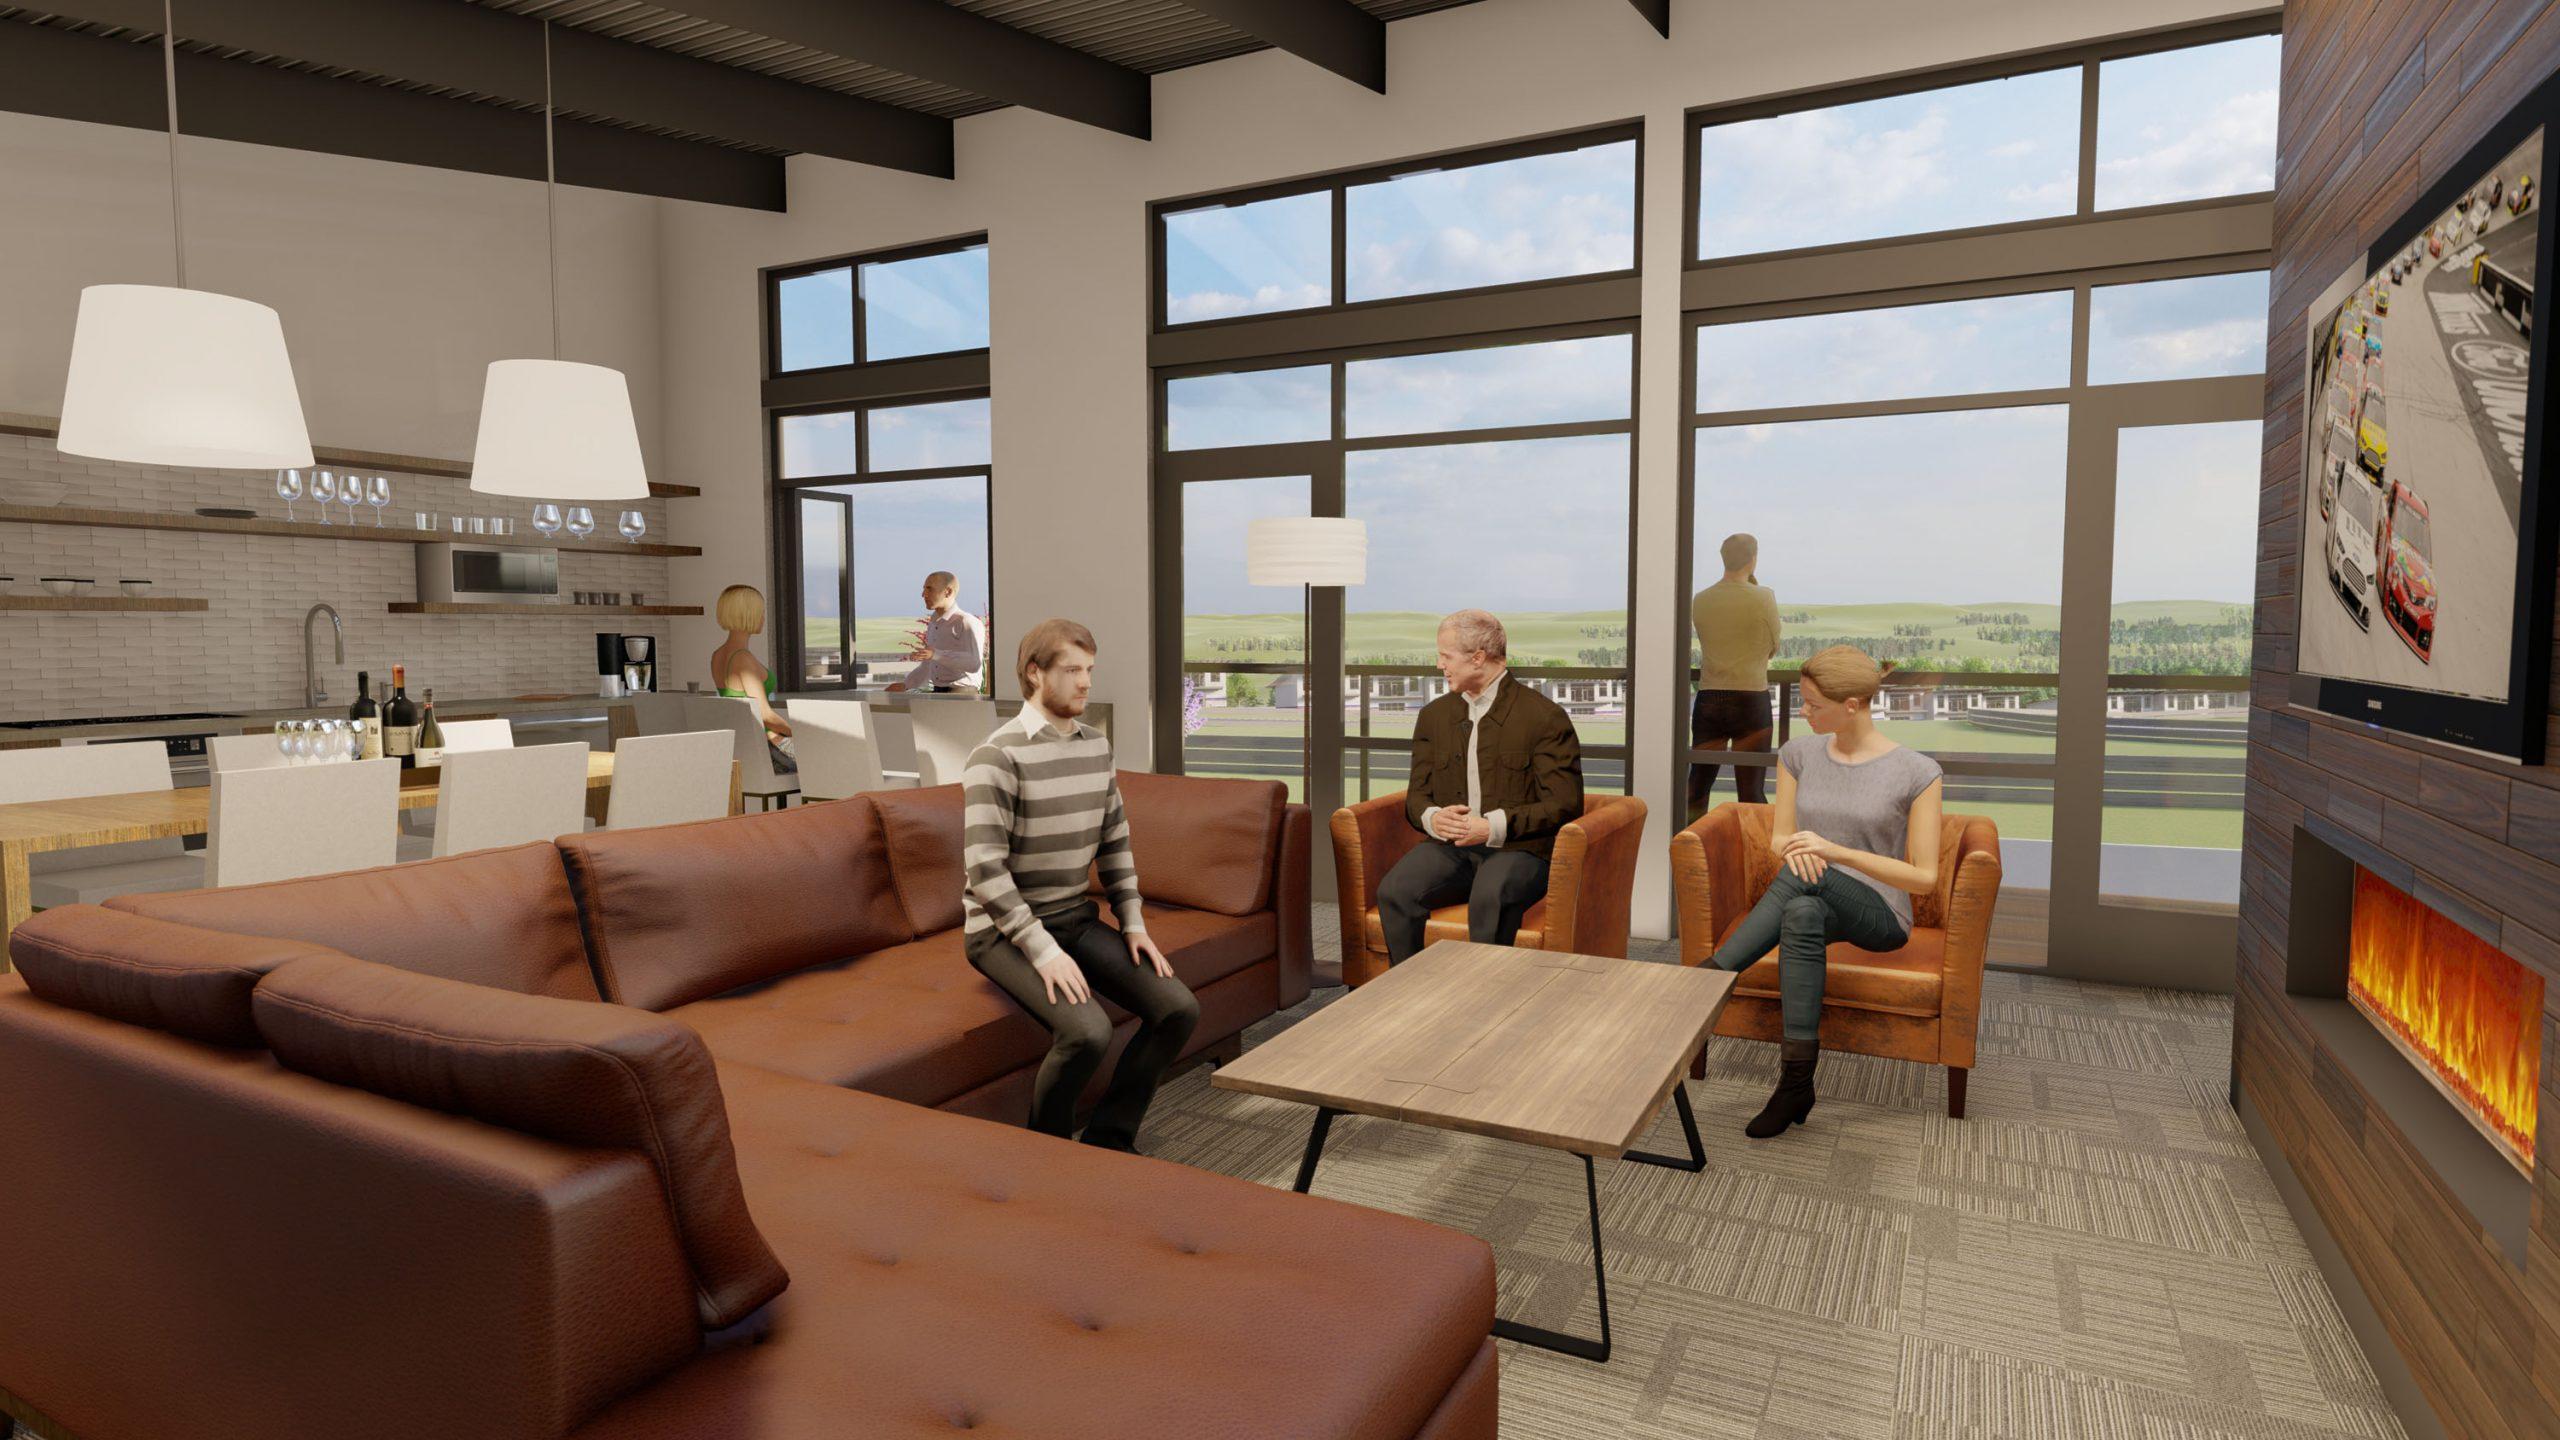 Autominiums condo rendering interior lounge space